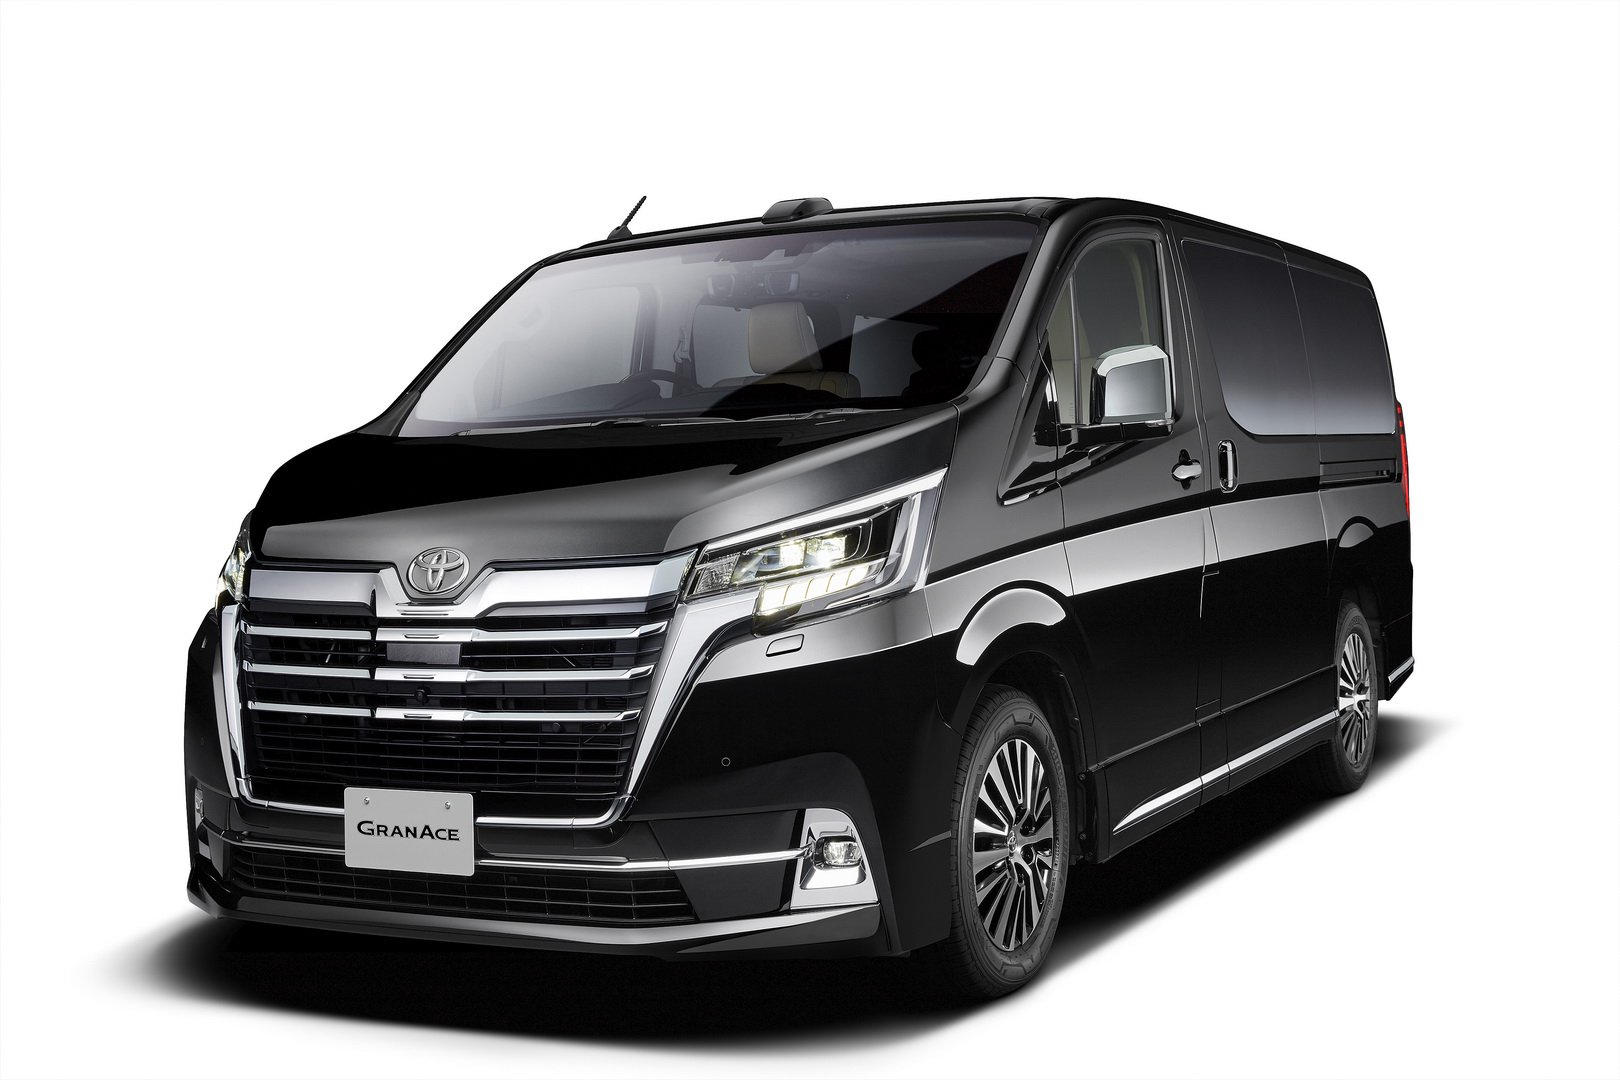 Toyota-GranAce-2020-1